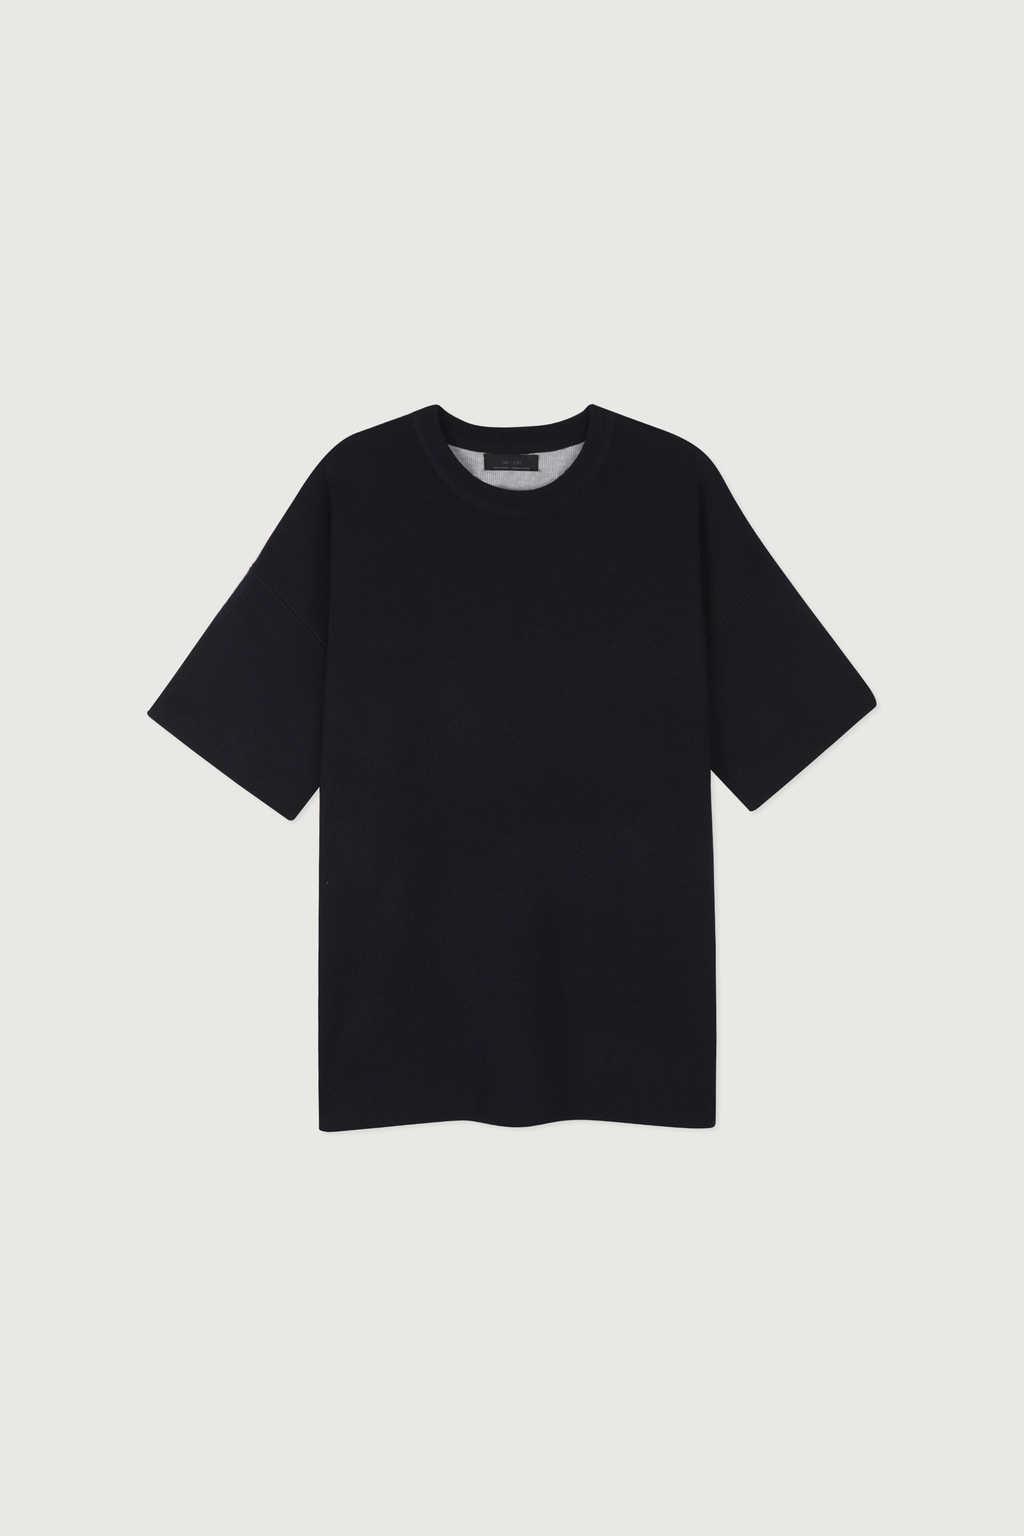 Sweater 3156 Navy 11